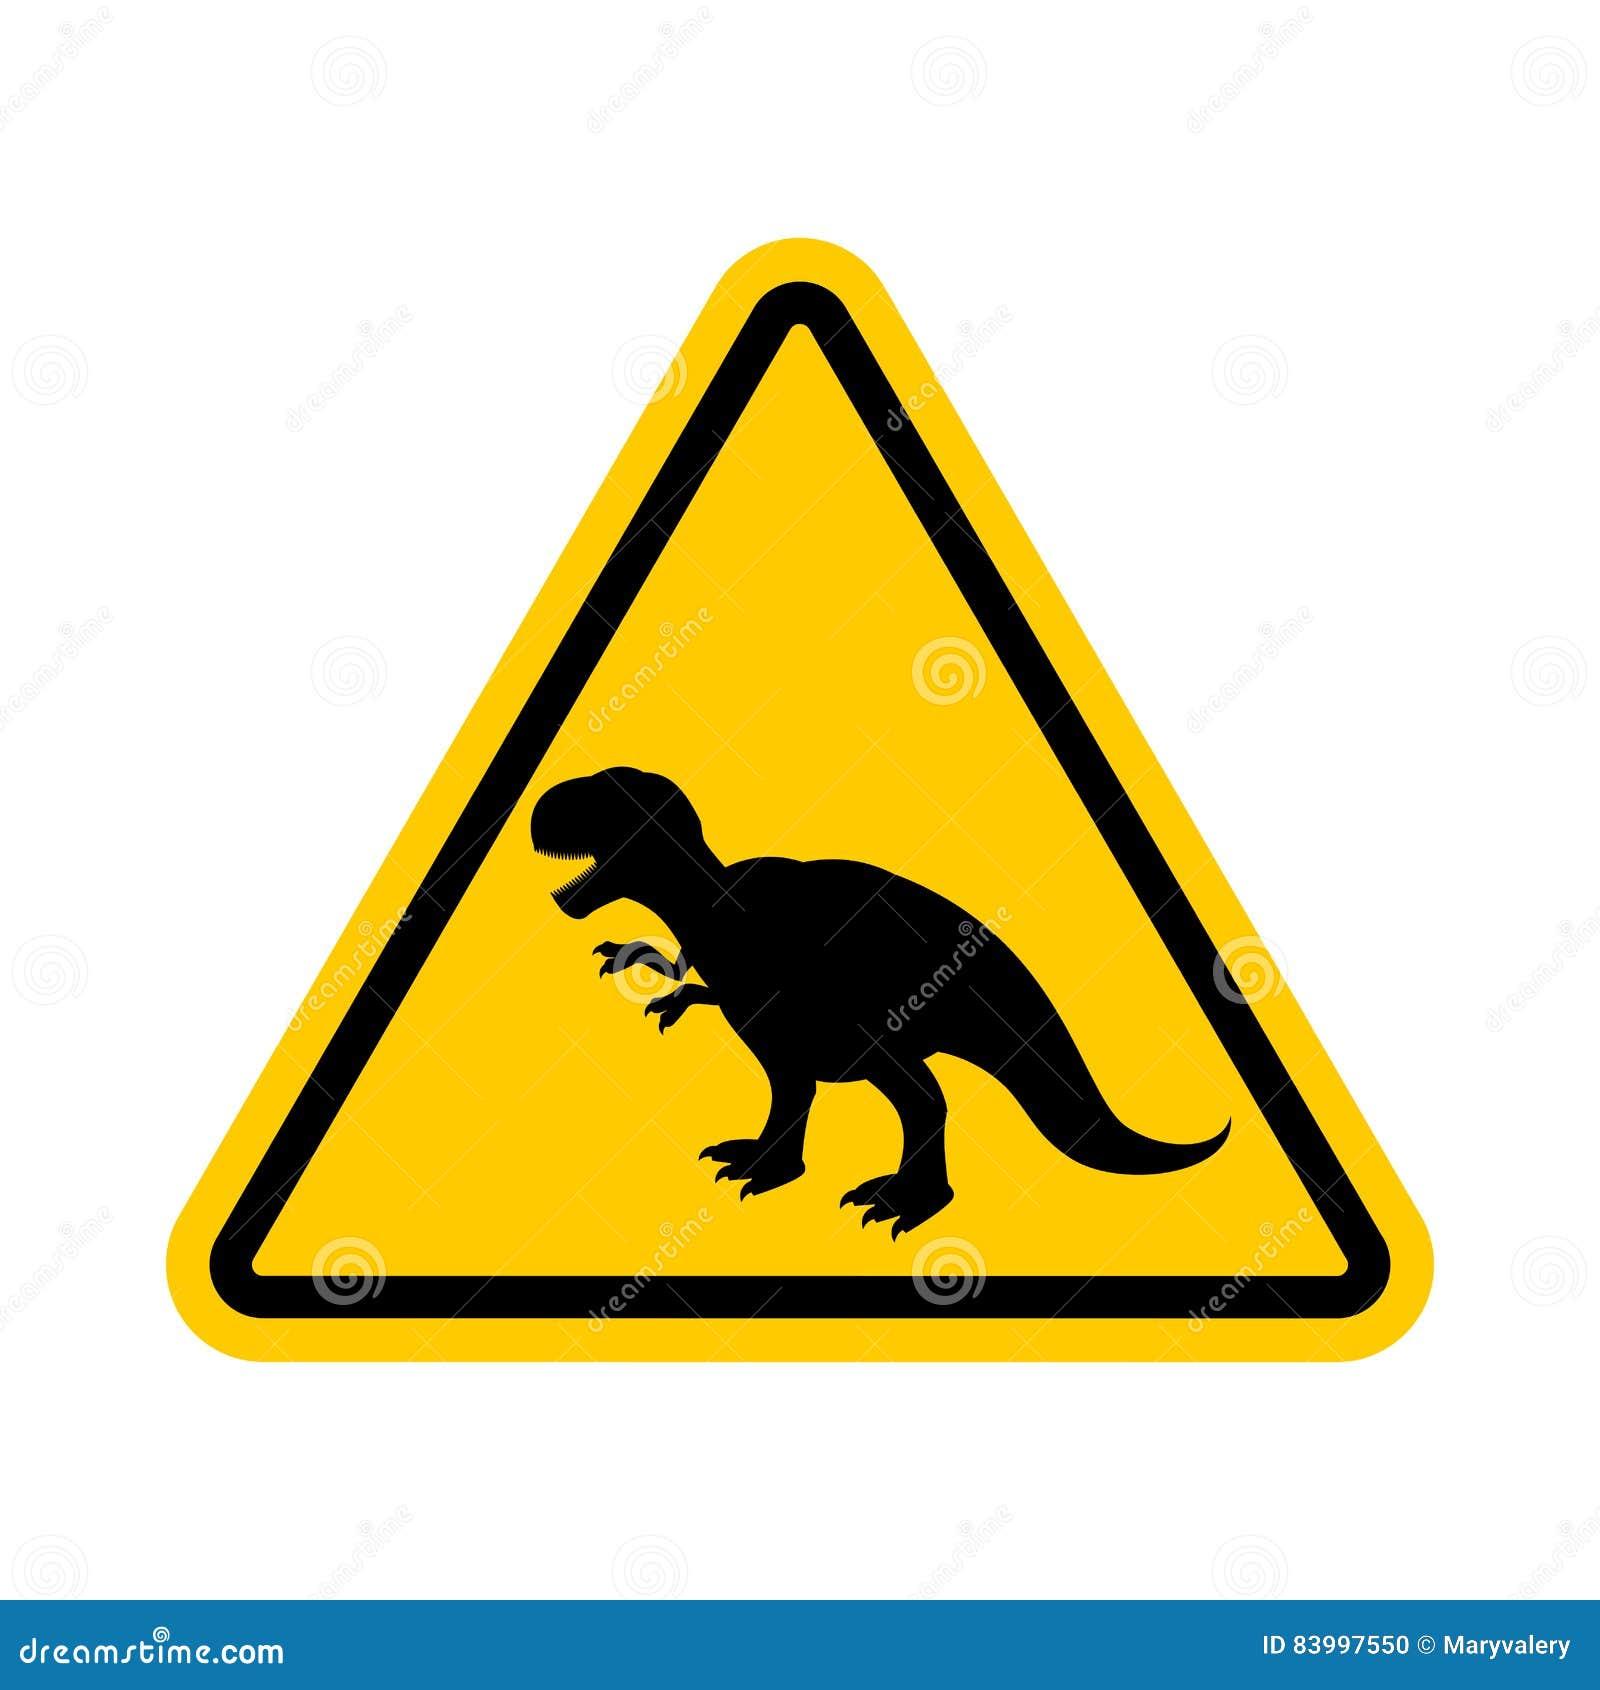 Lly Duramax Ficm Wiring Diagram: Tyrannosaurust Rex: Aandachtsdinosaurus Gevaren Van Rode